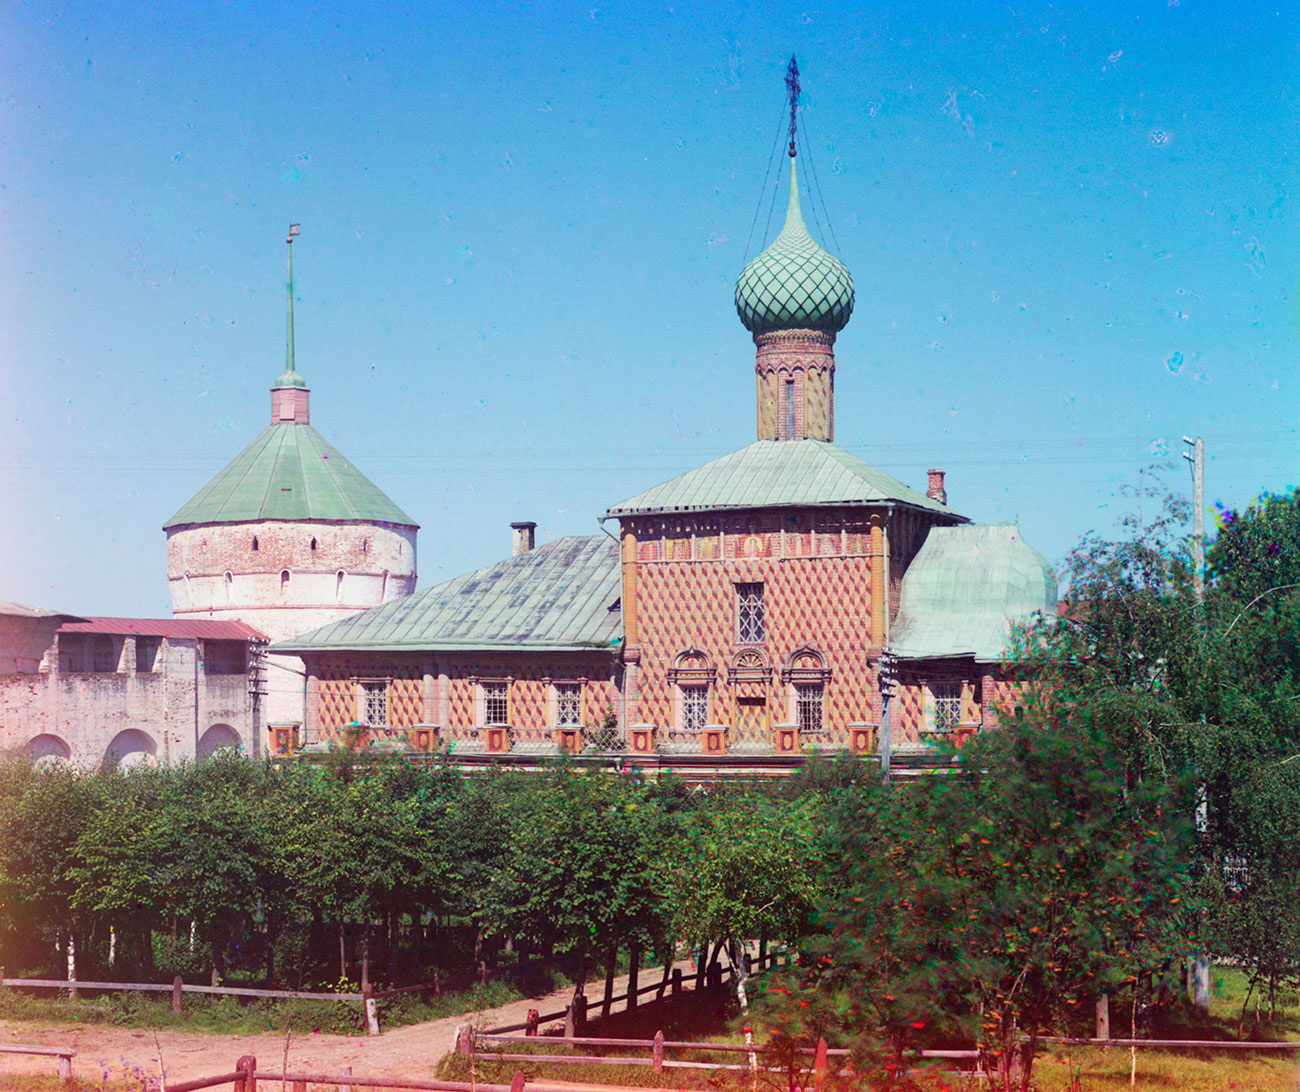 Rostov kremlin. Northwest corner tower & Church of the Hodegetria Icon, south view. July 12, 2012. Summer 1911.  / Photo: Sergei Prokudin-Gorsky